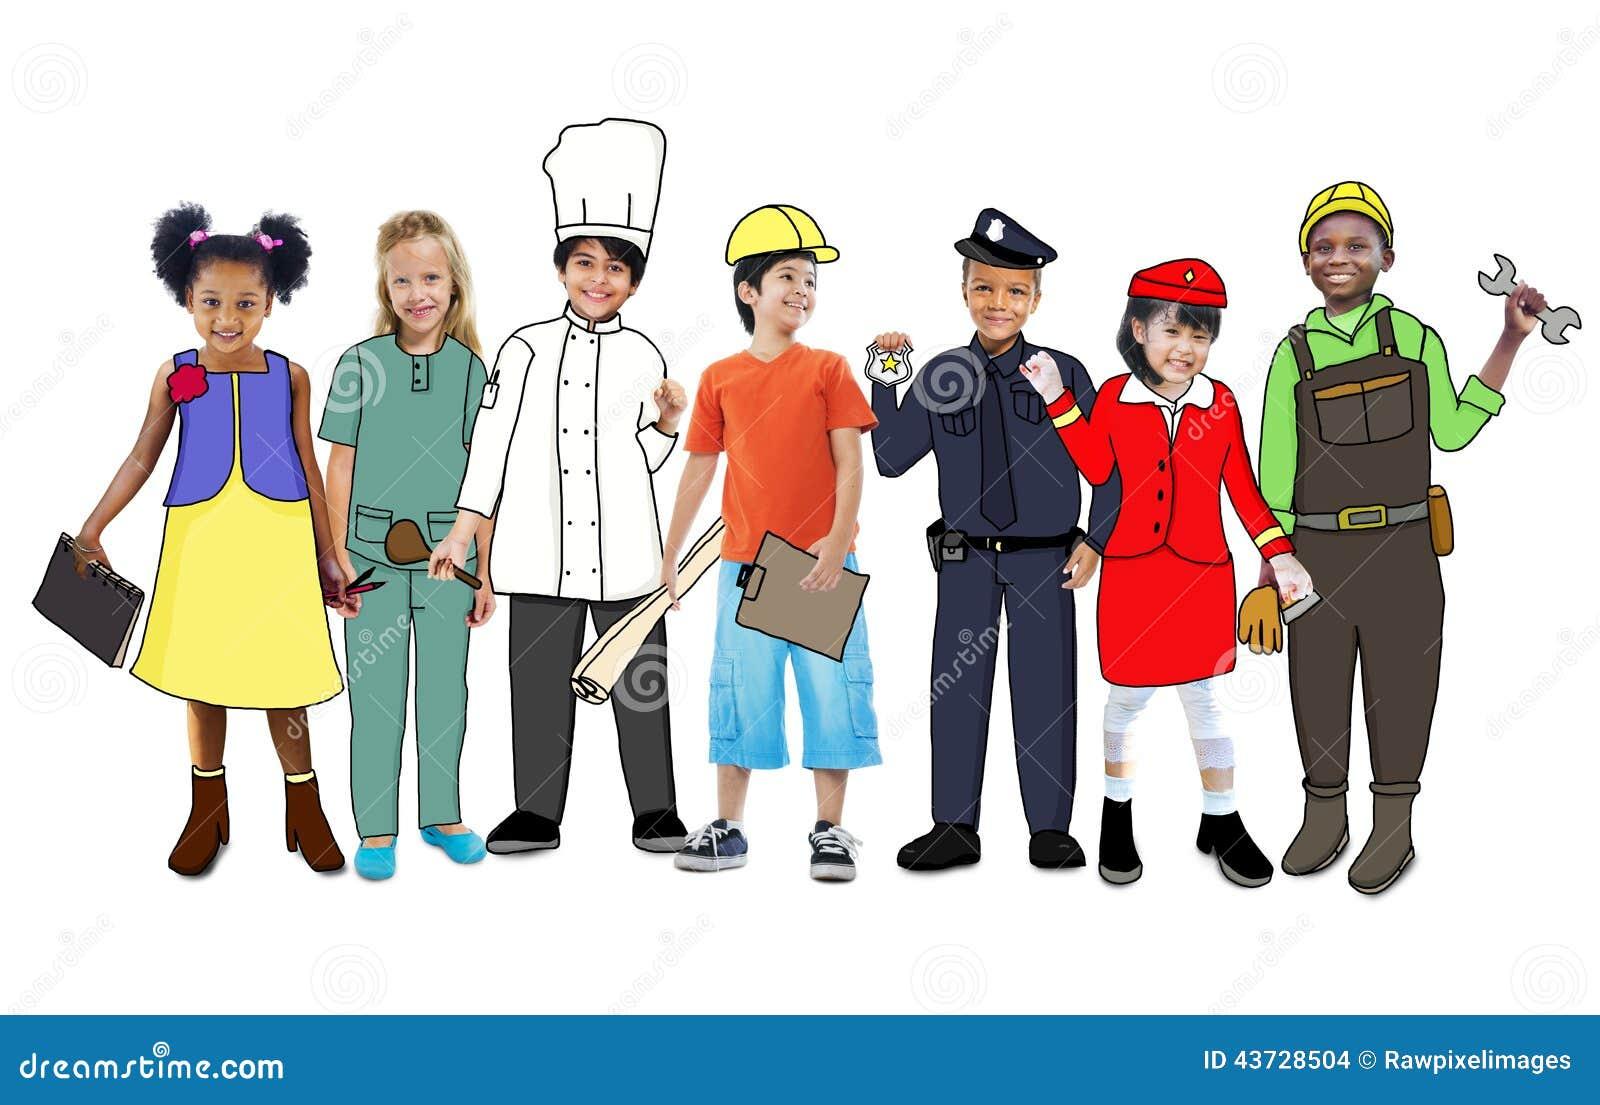 Children Wearing Future Job Uniforms Stock Illustration ...